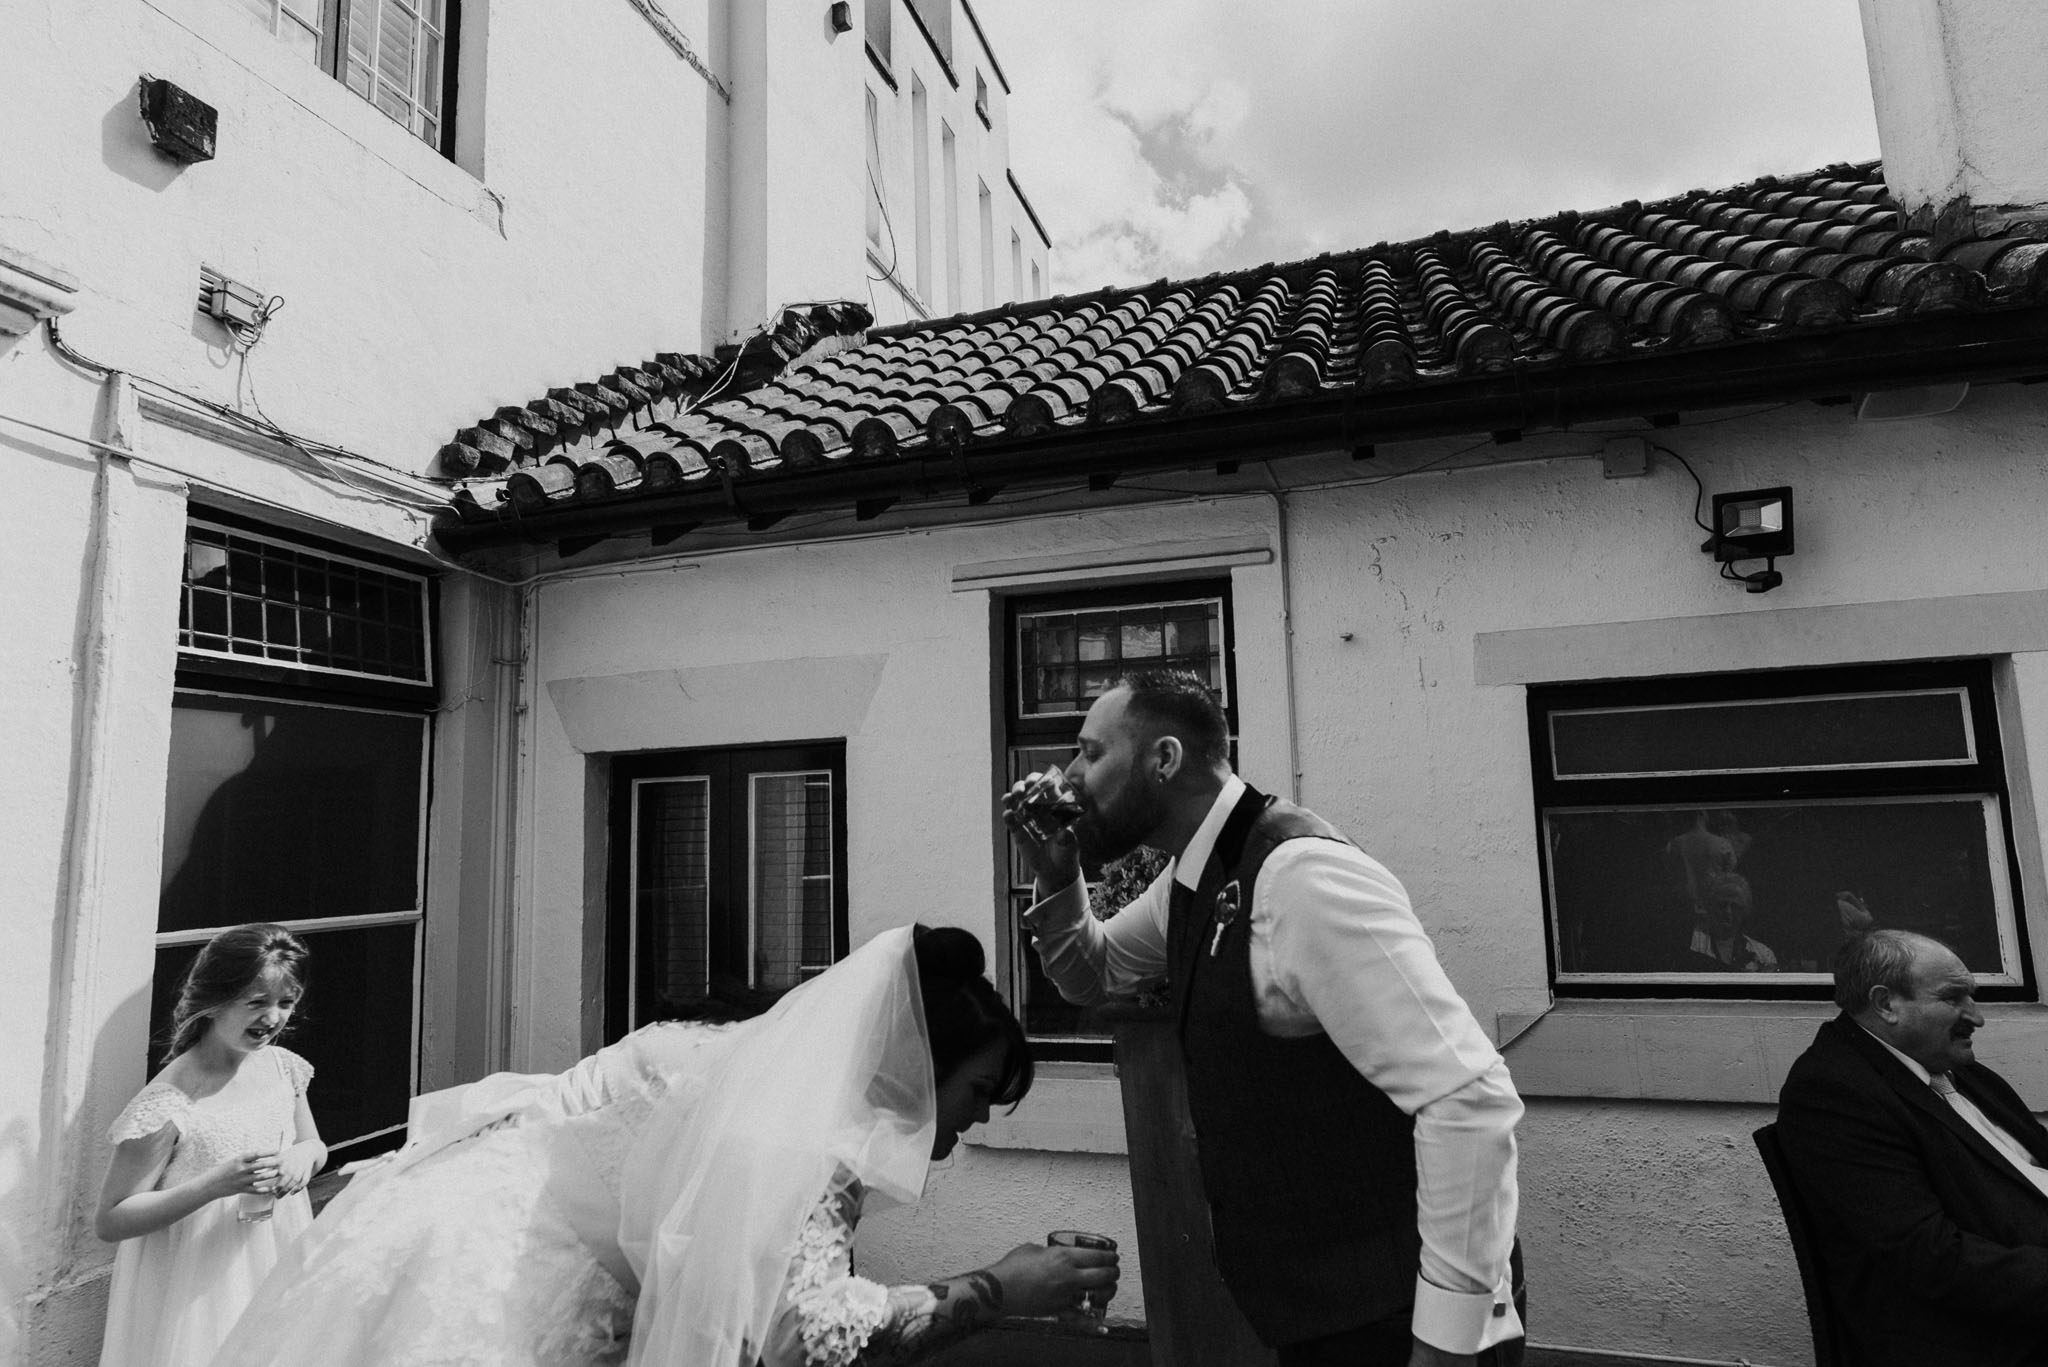 fun-wedding-photography-at-the-belle-epoque-knutsford-wedding-photographer (4).jpg